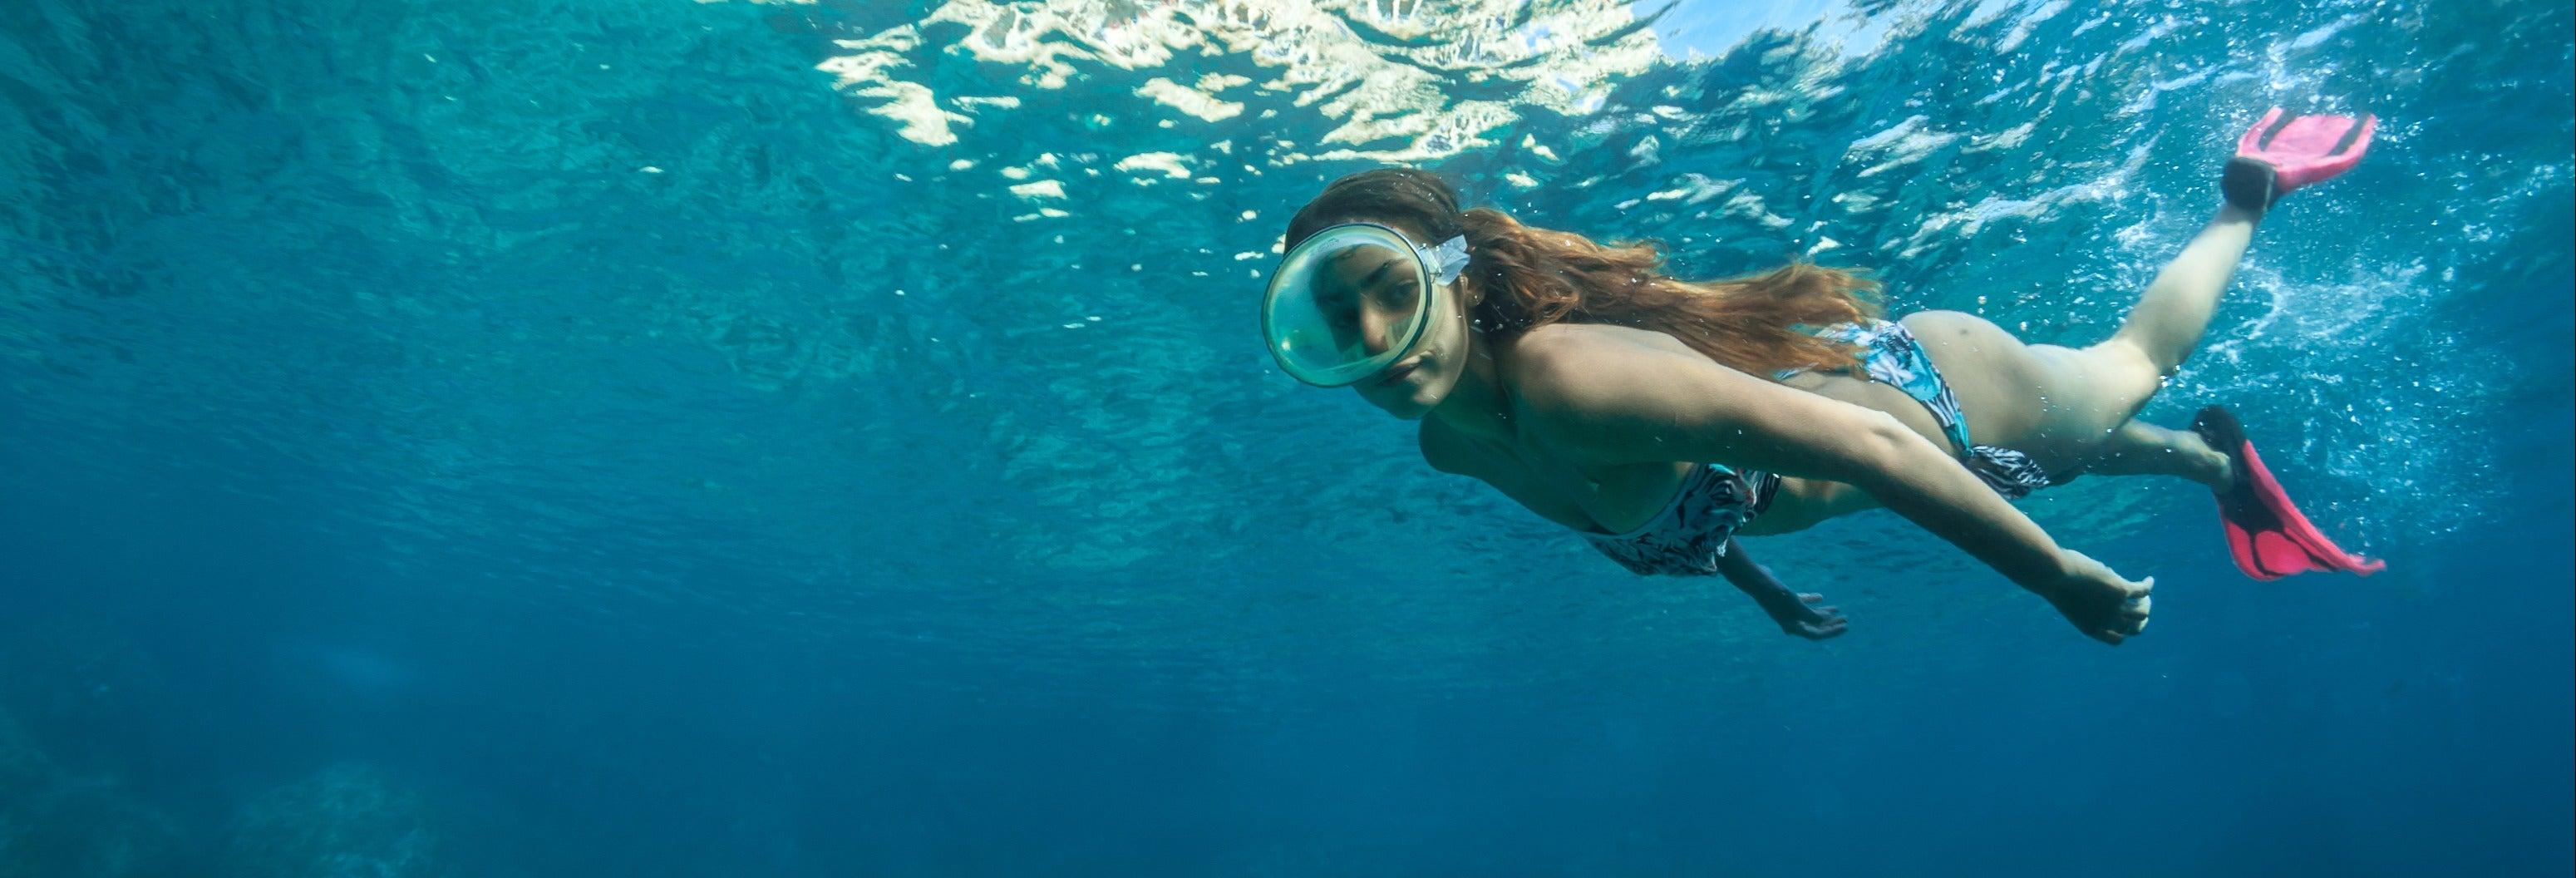 Snorkel en Costa Teguise